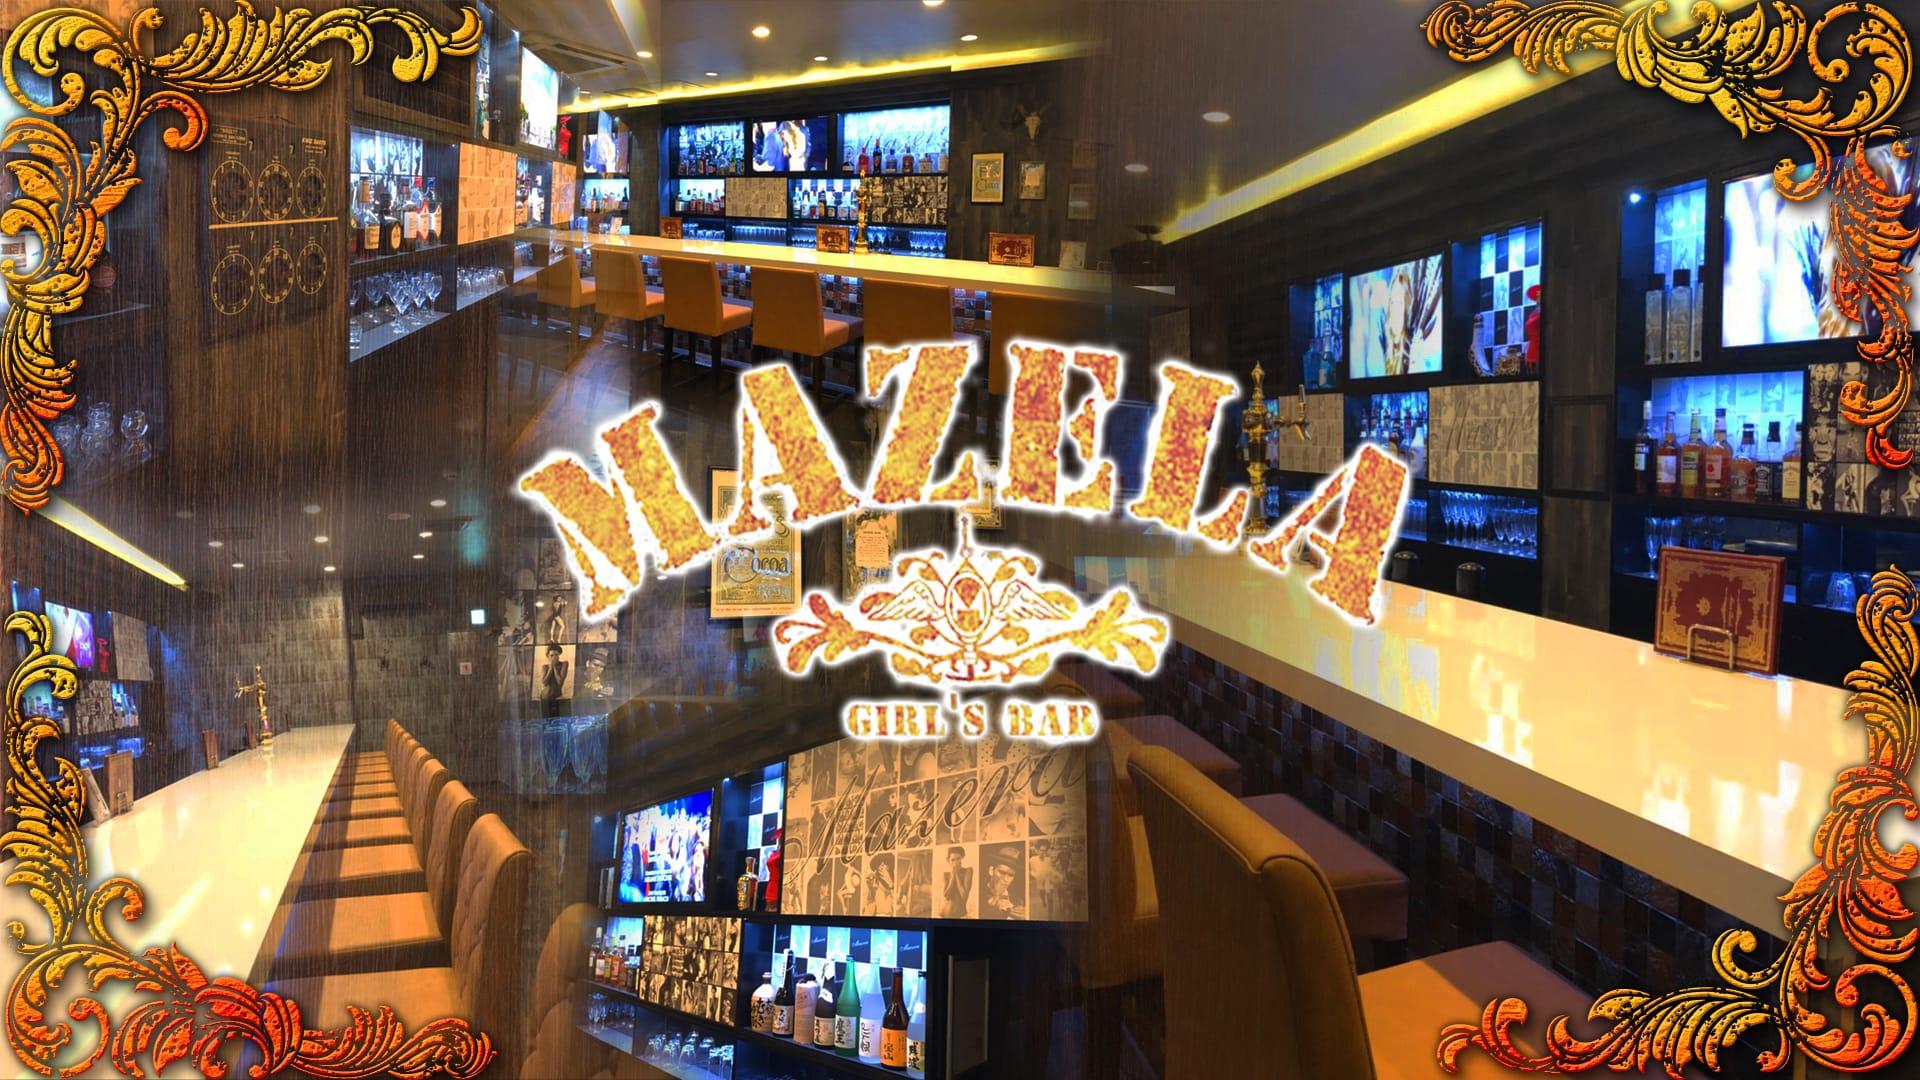 Girl's Bar MAZELA(マゼラ) 立川ガールズバー TOP画像